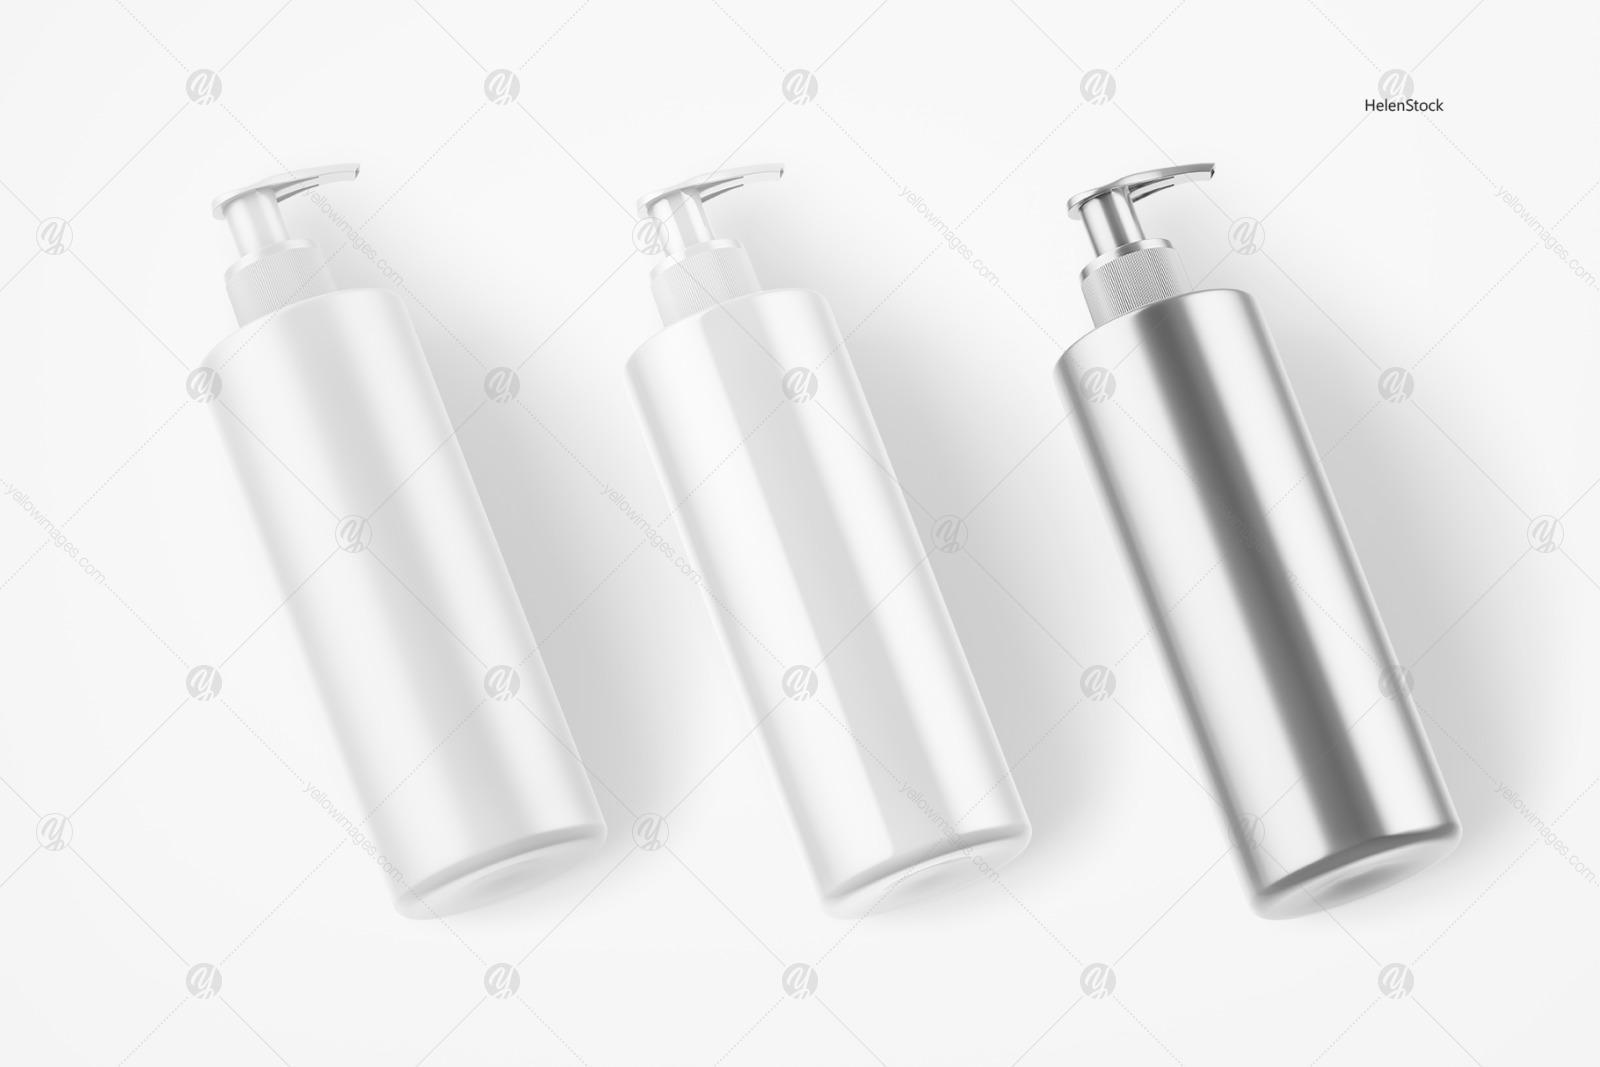 Soap Bottle Mockup - Halfside View